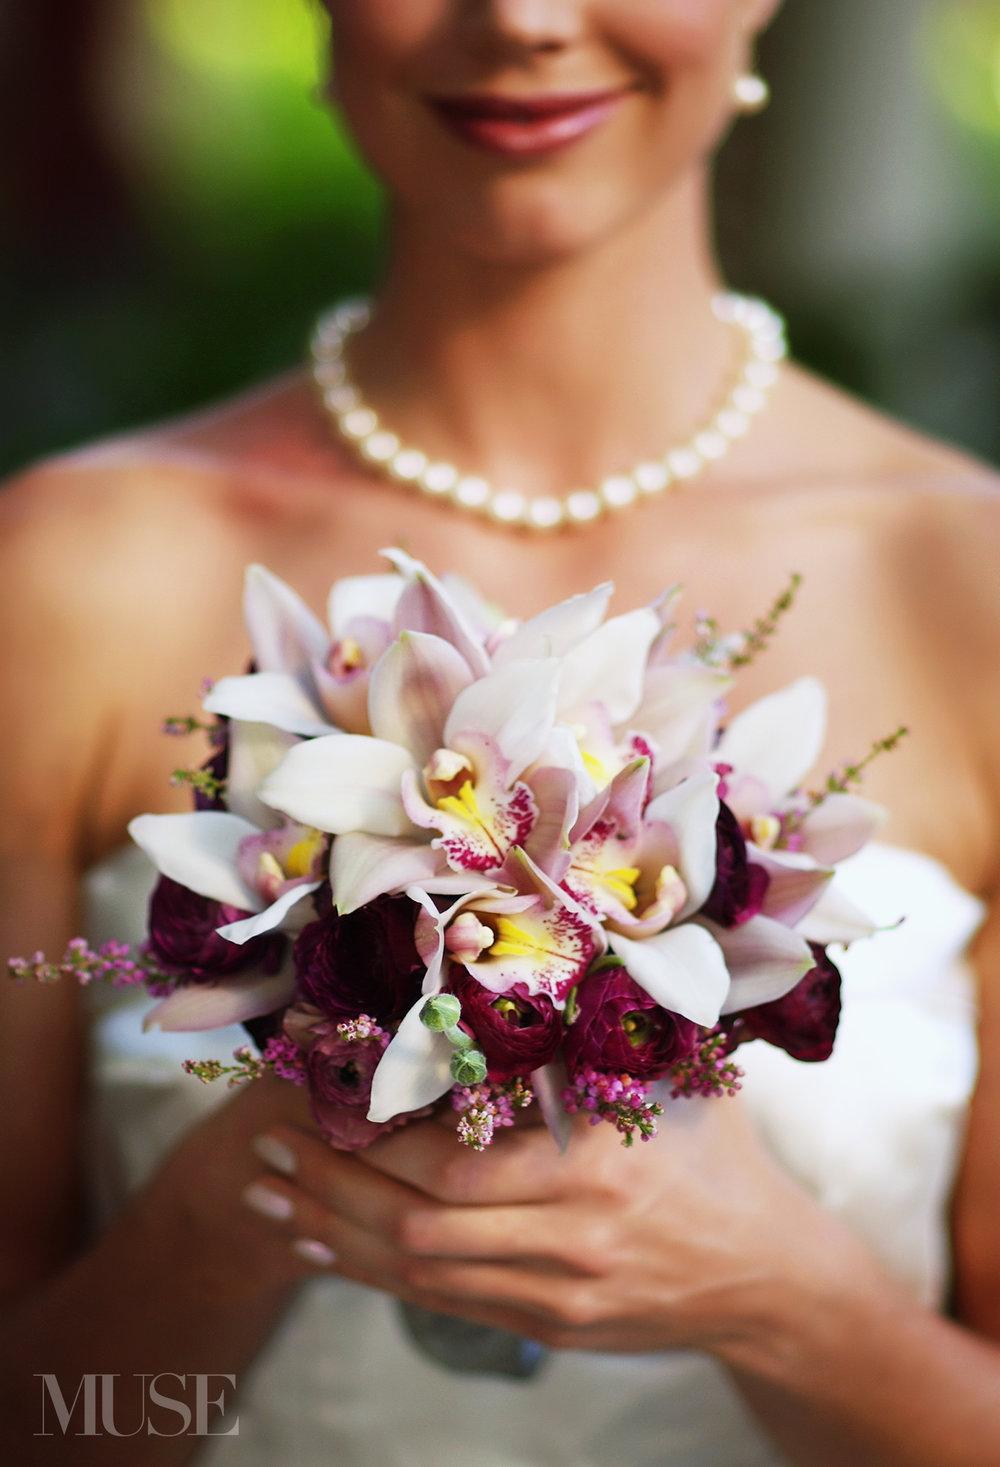 MUSE Bride Erick Rhodes Photography Wedding Floral Editorial